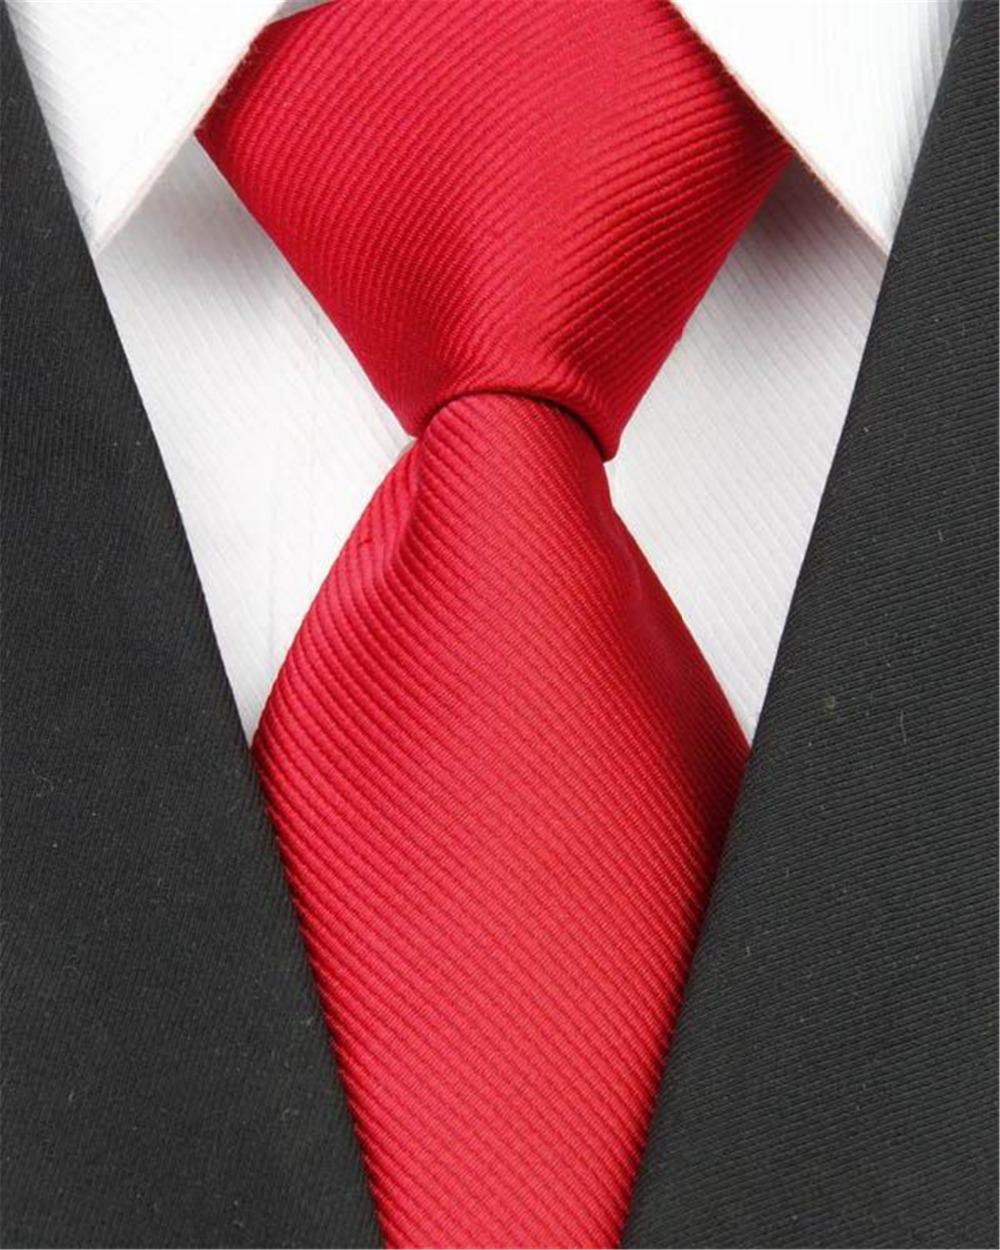 New 2015 Men's Fashion Accessories Stripe Pattern Jacquard Woven Business Silk Tie Necktie for Men Black Navy Blue Green Red()